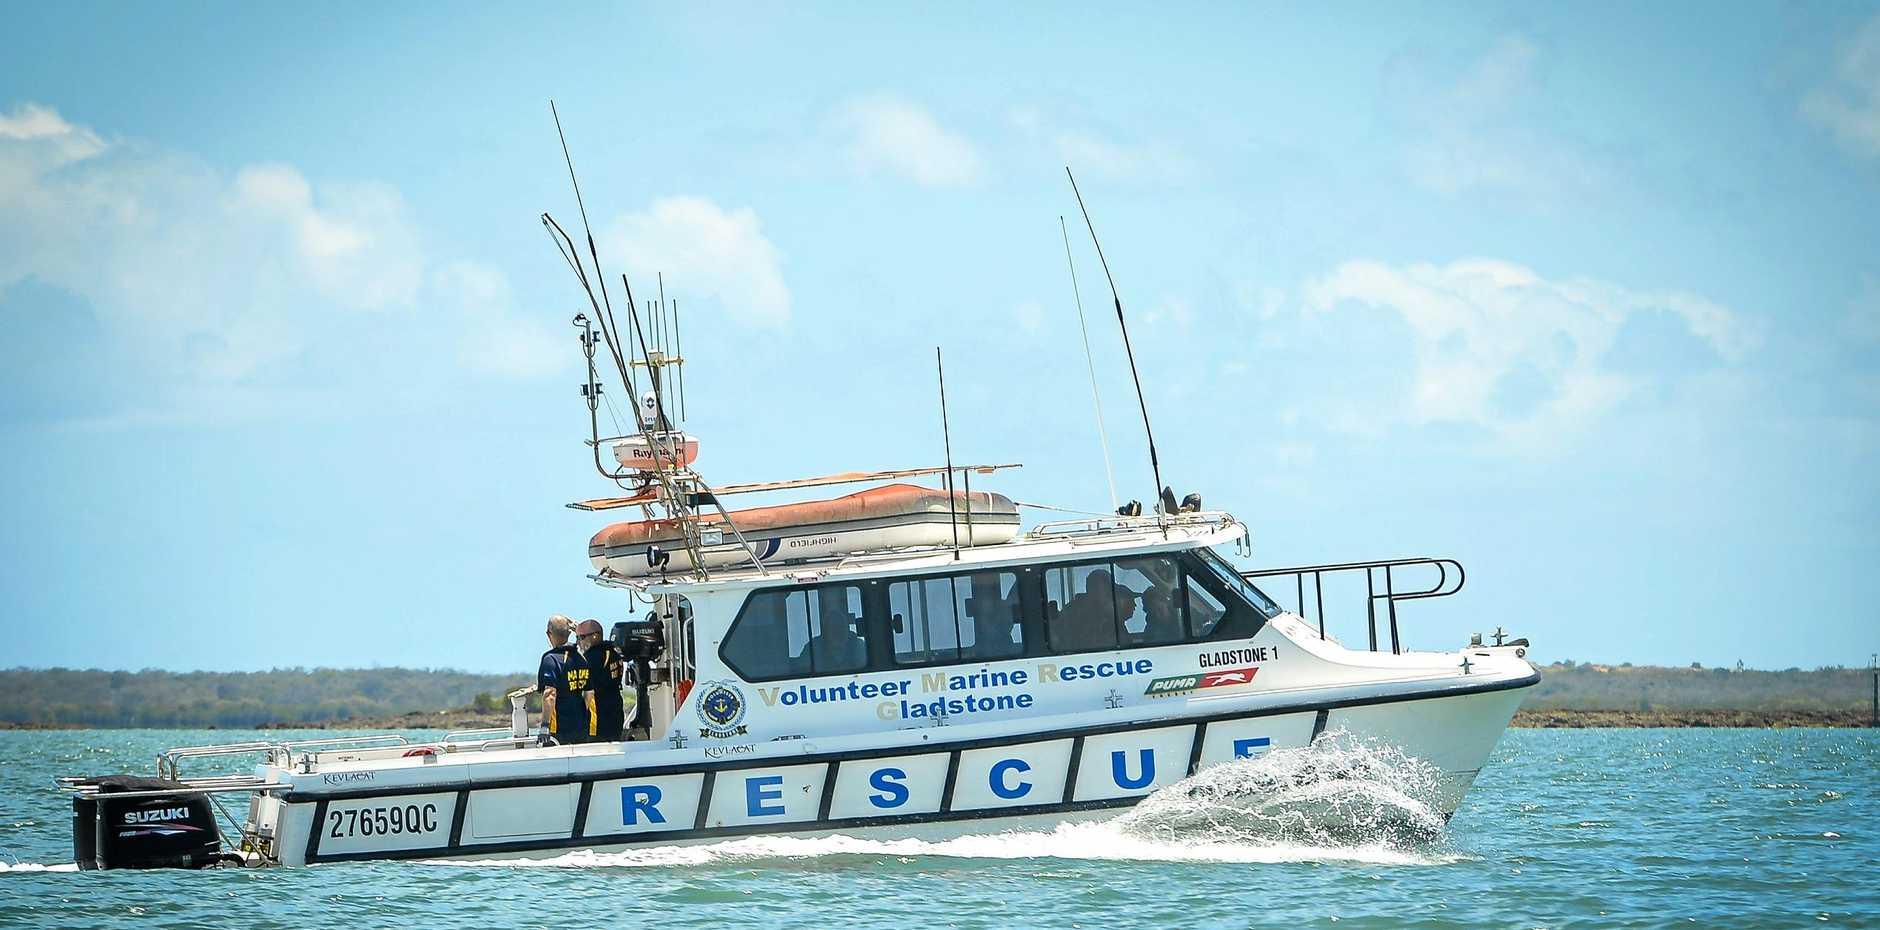 RAPID RESPONSE: Gladstone Volunteer Marine Rescue, Gladstone 1 VMR.